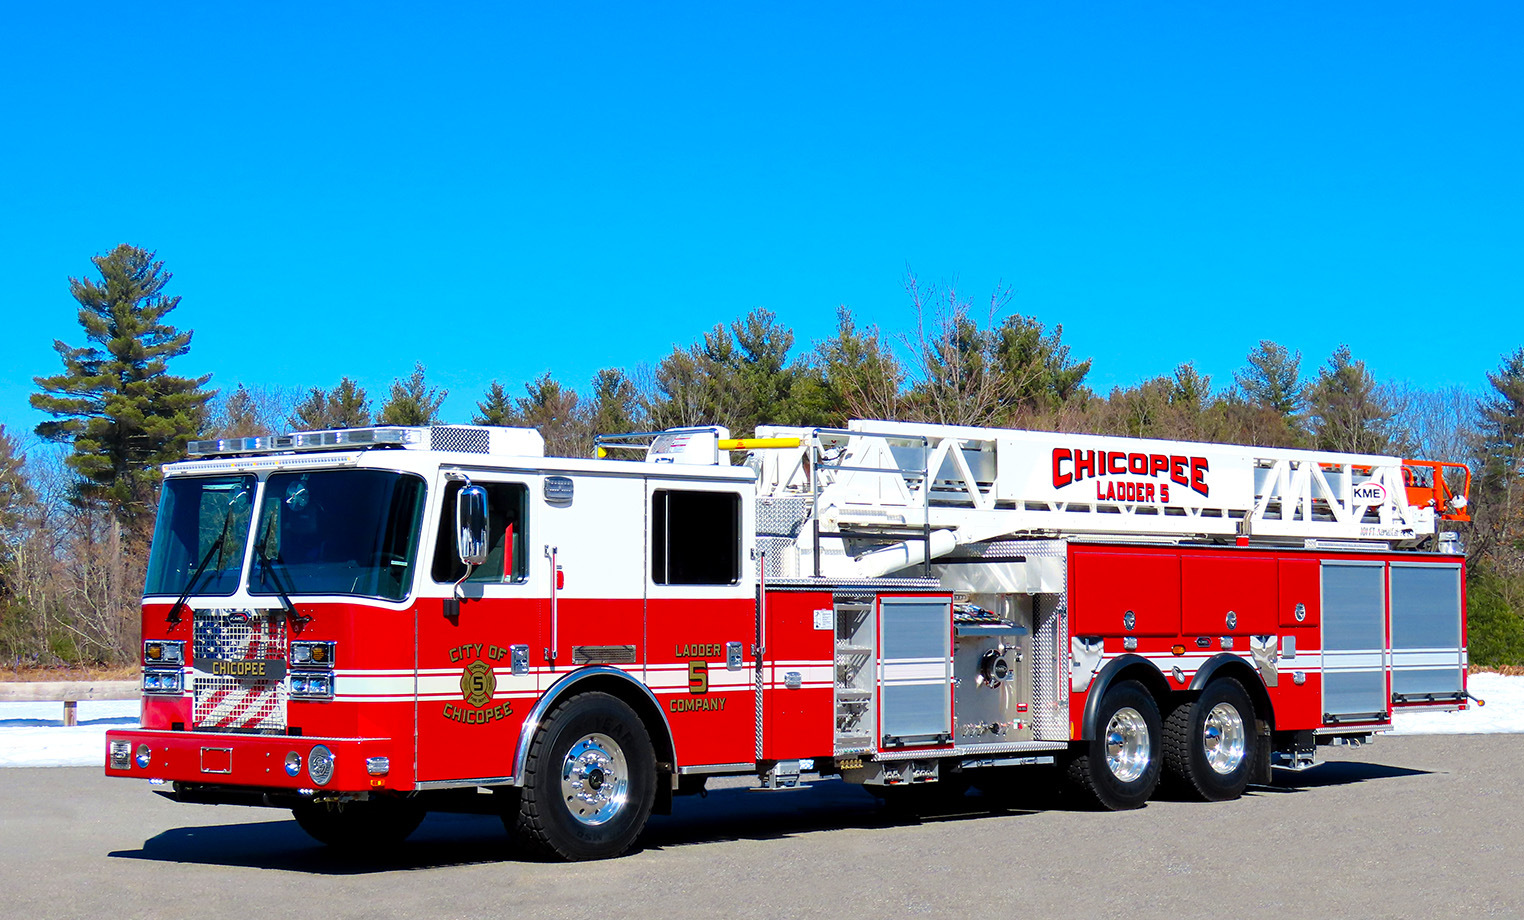 Chicopee-Ladder-5-2021